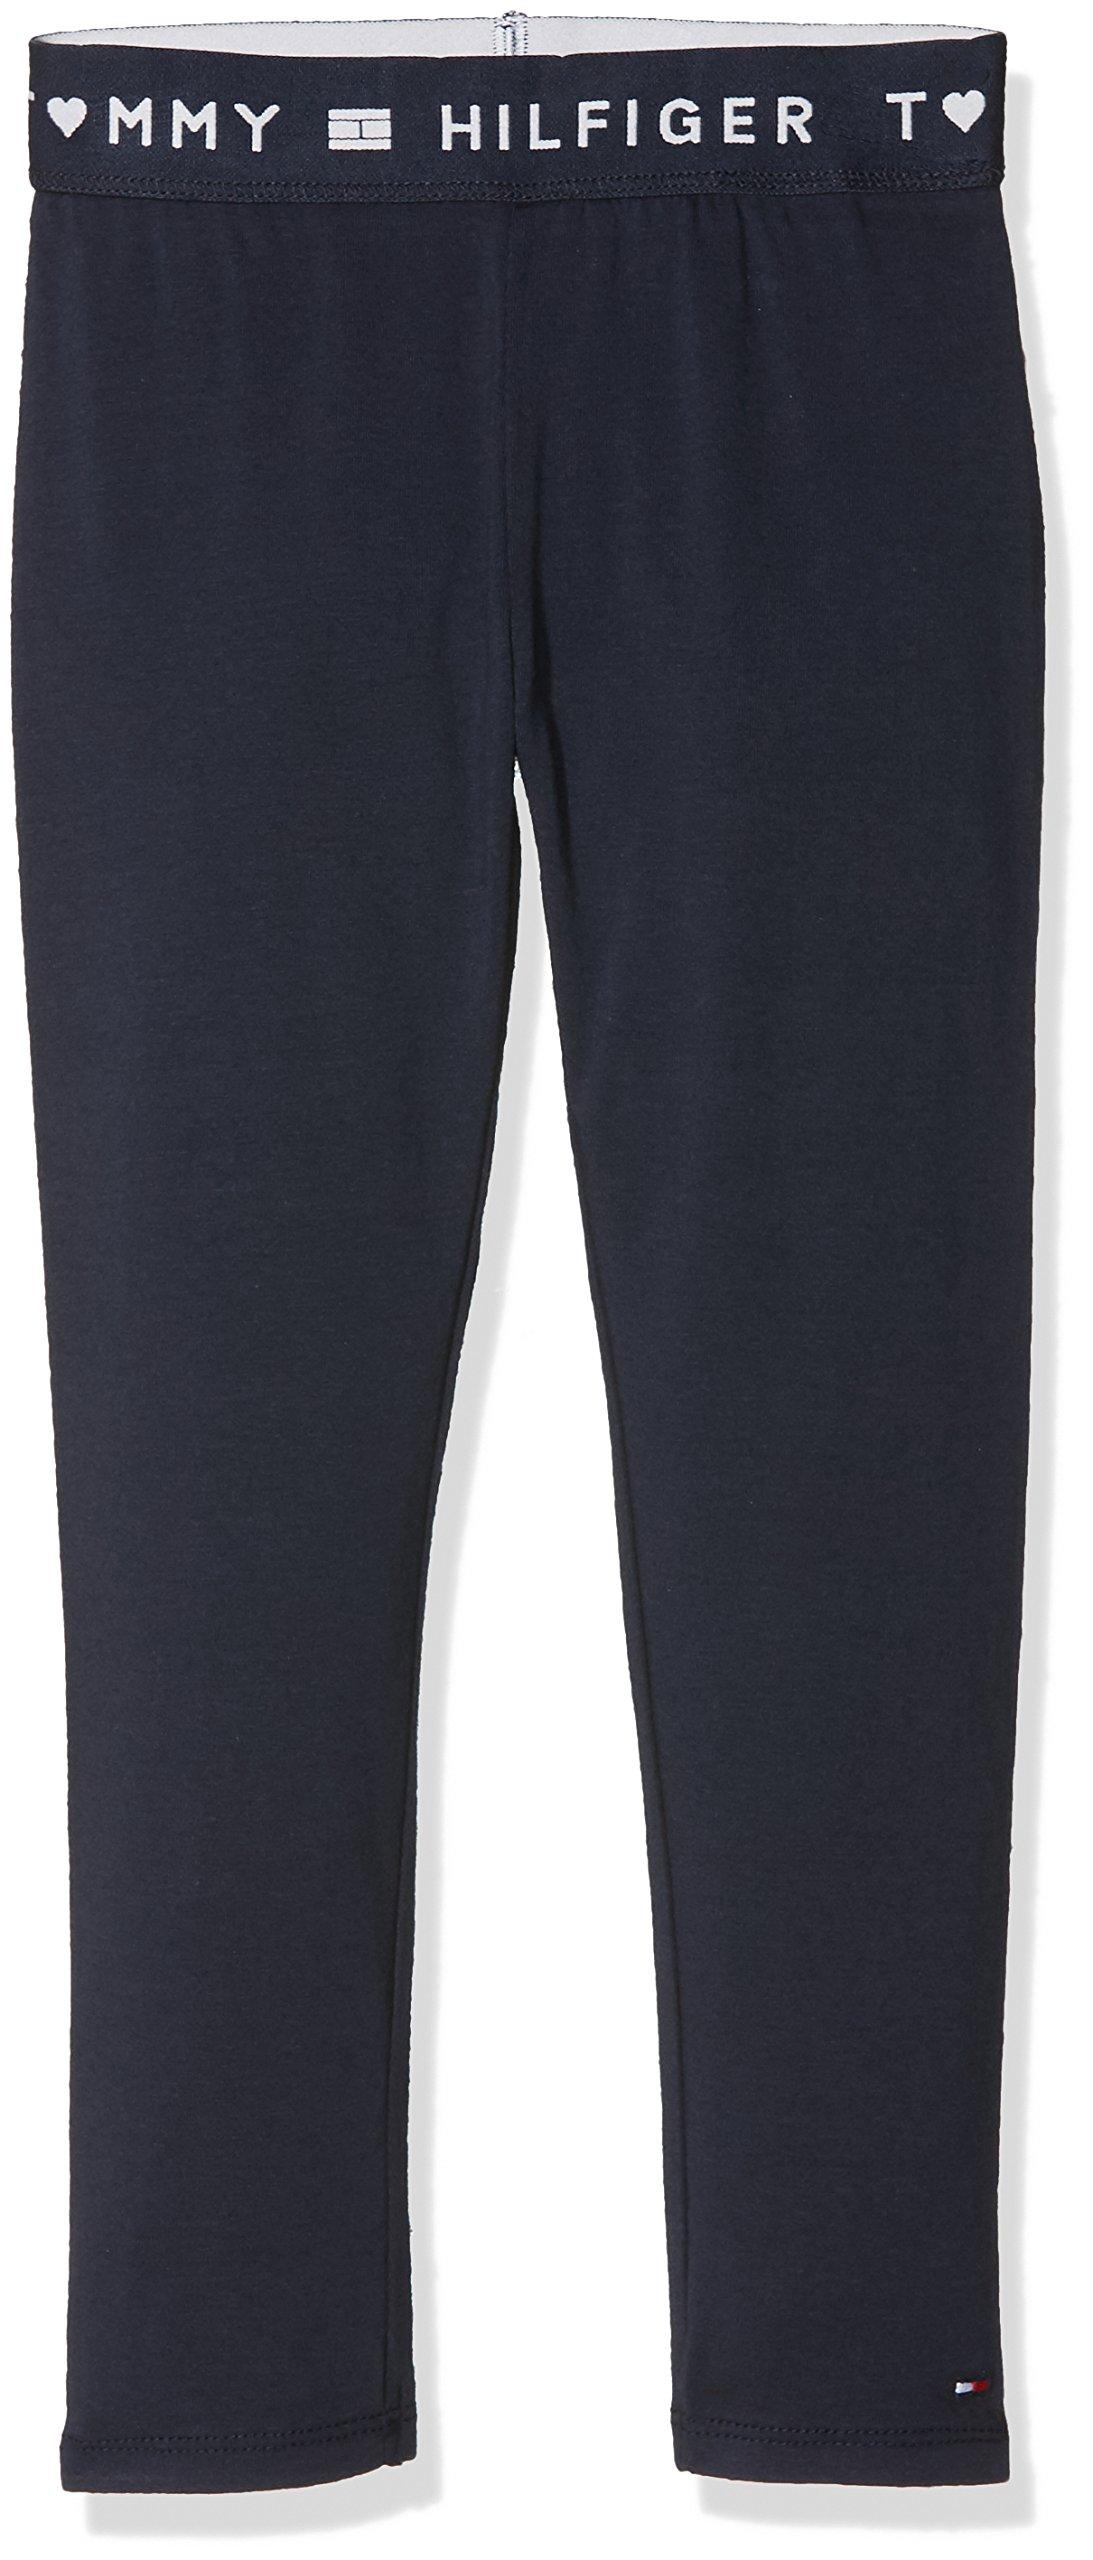 Tommy Hilfiger M Ame S Legging Pantalones para Niñas